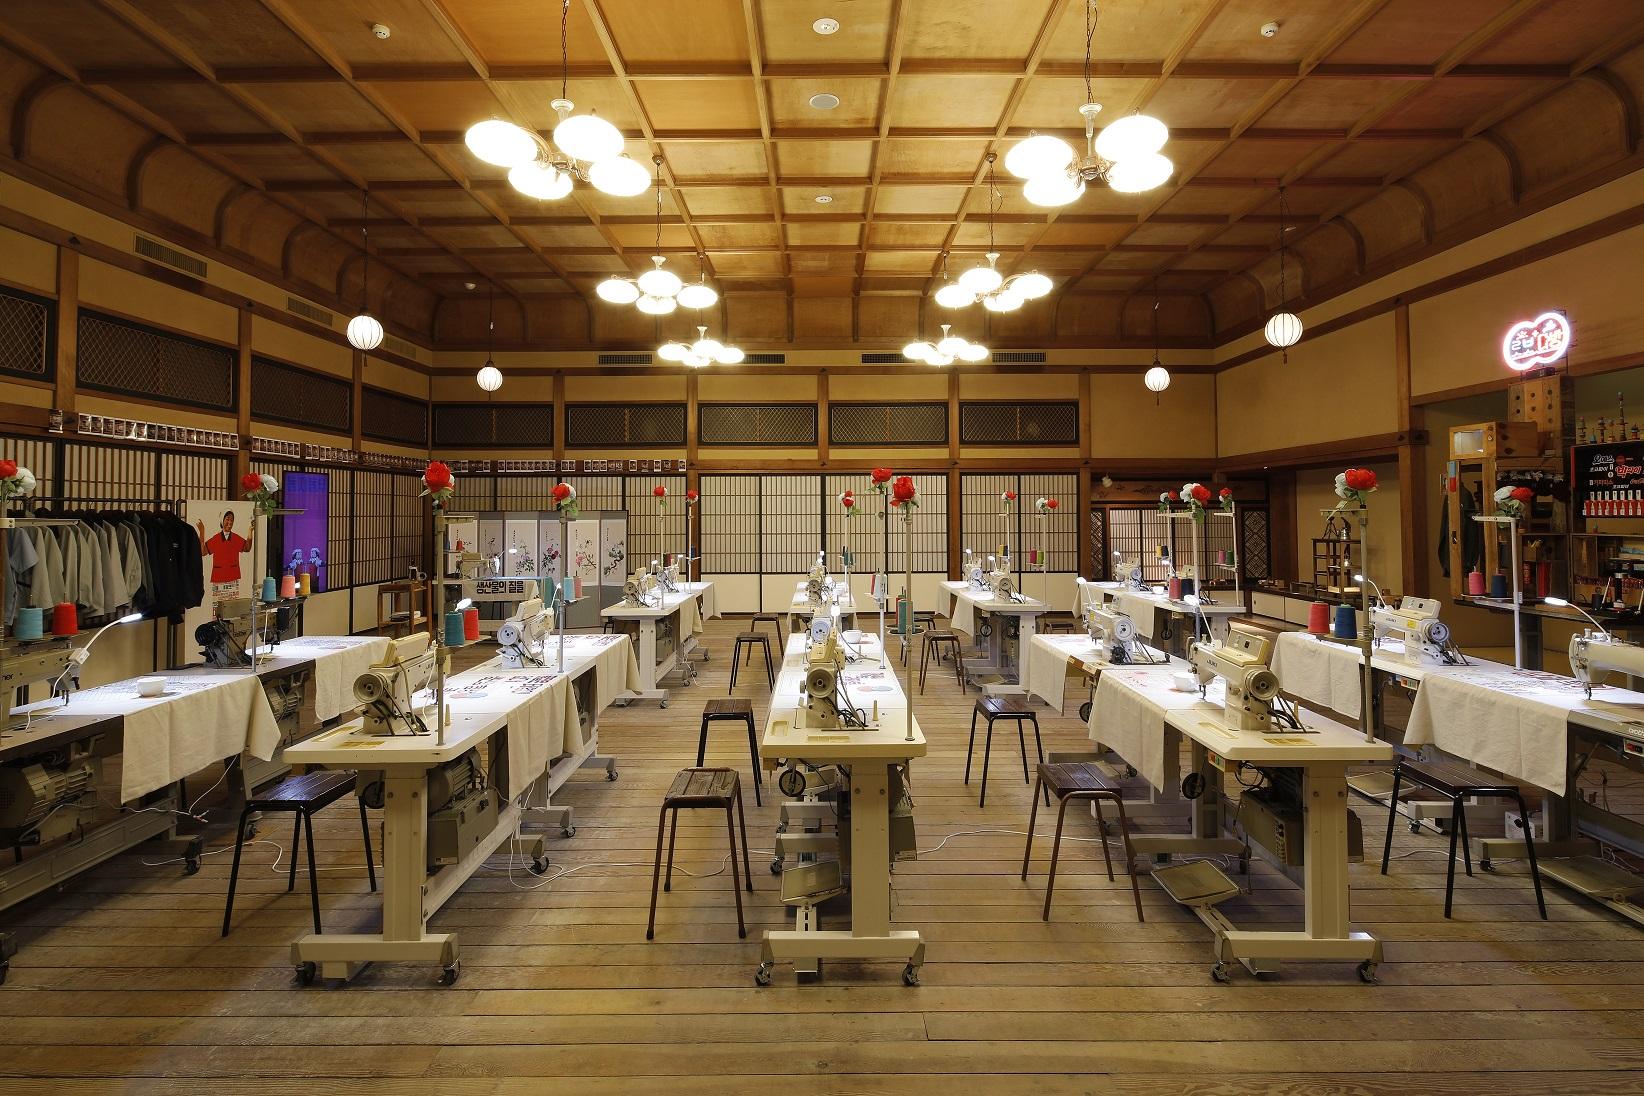 【KYOTO EXPERIMENT】2019グループ展『ケソン工業団地』展示風景<br /> 撮影:来田猛